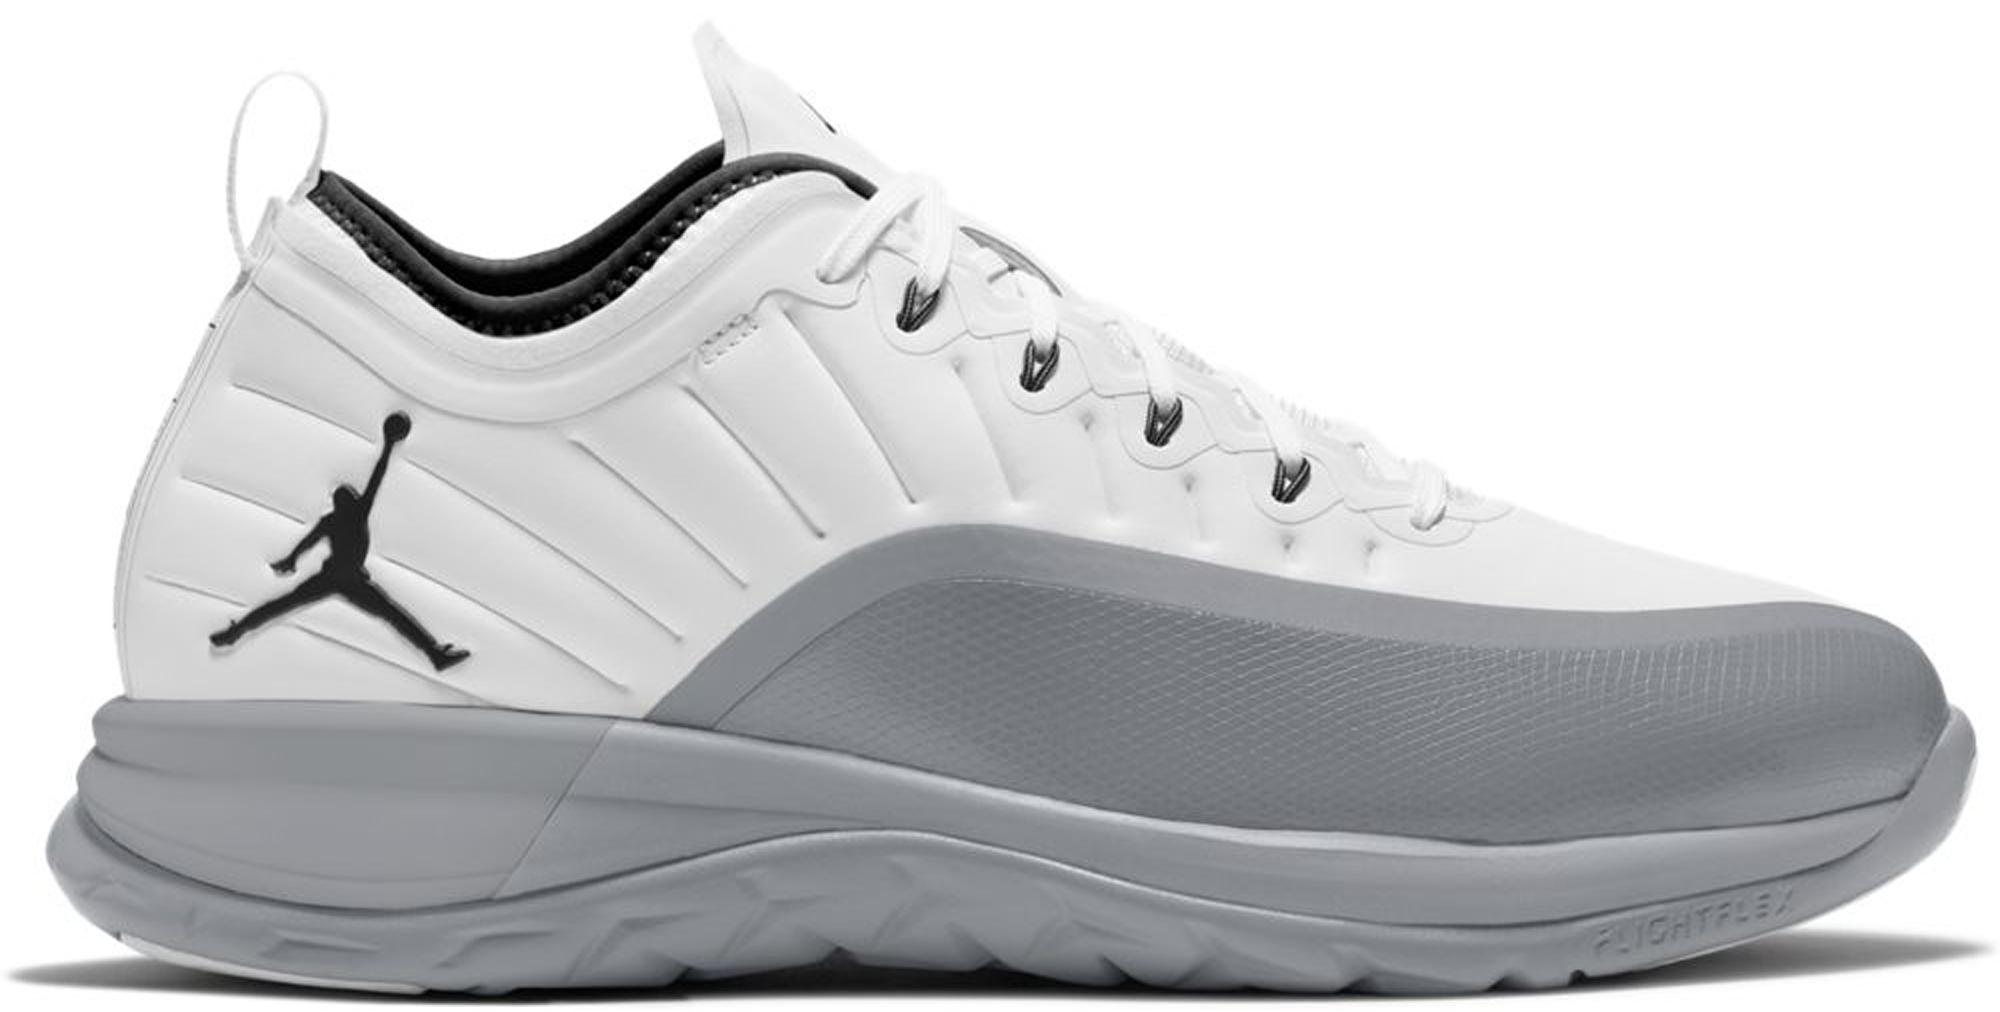 Jordan Trainer Prime White Wolf Grey